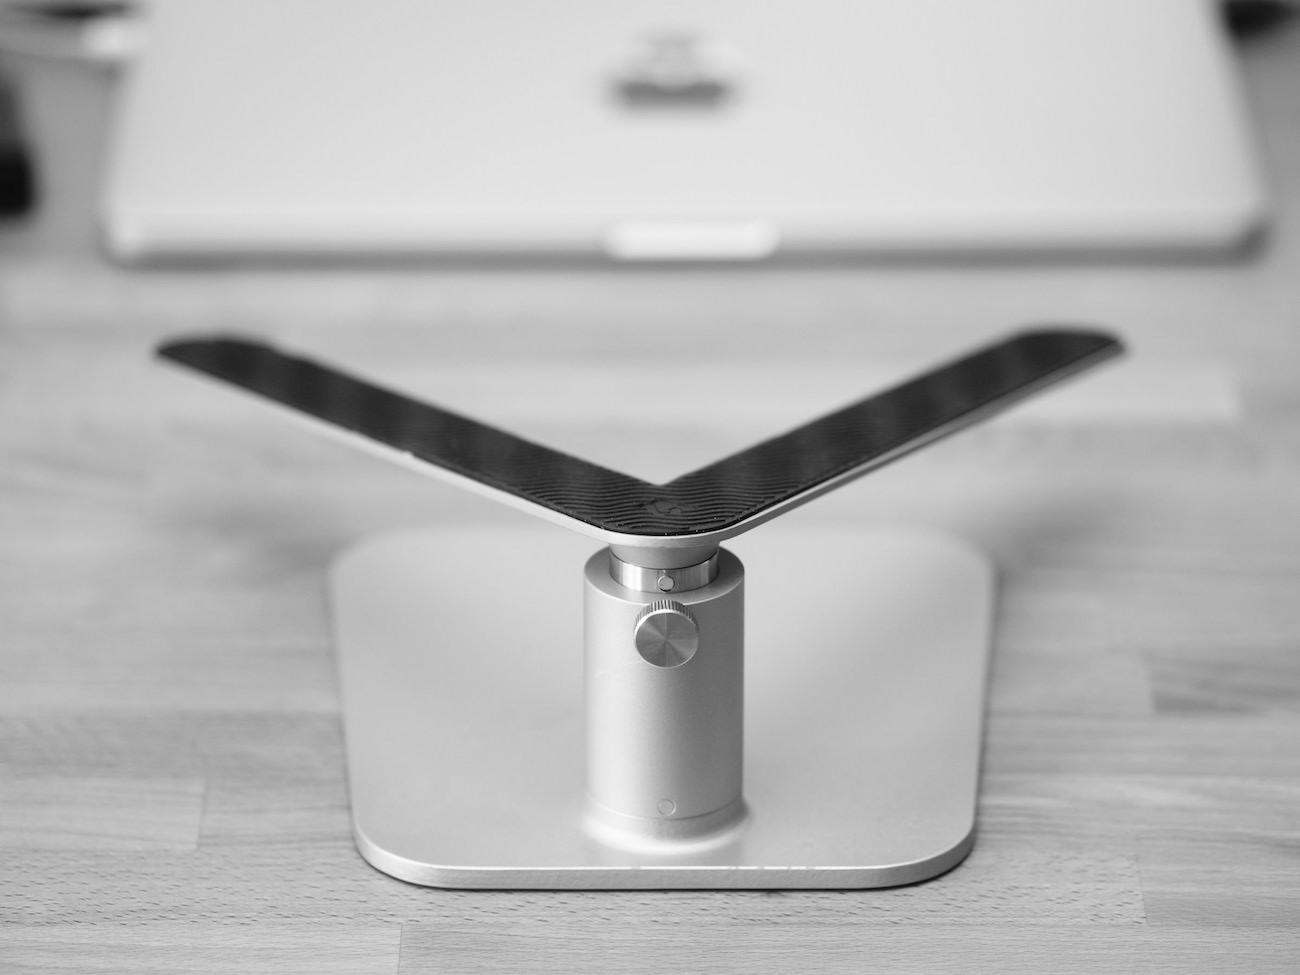 hirise-for-macbook-new-03